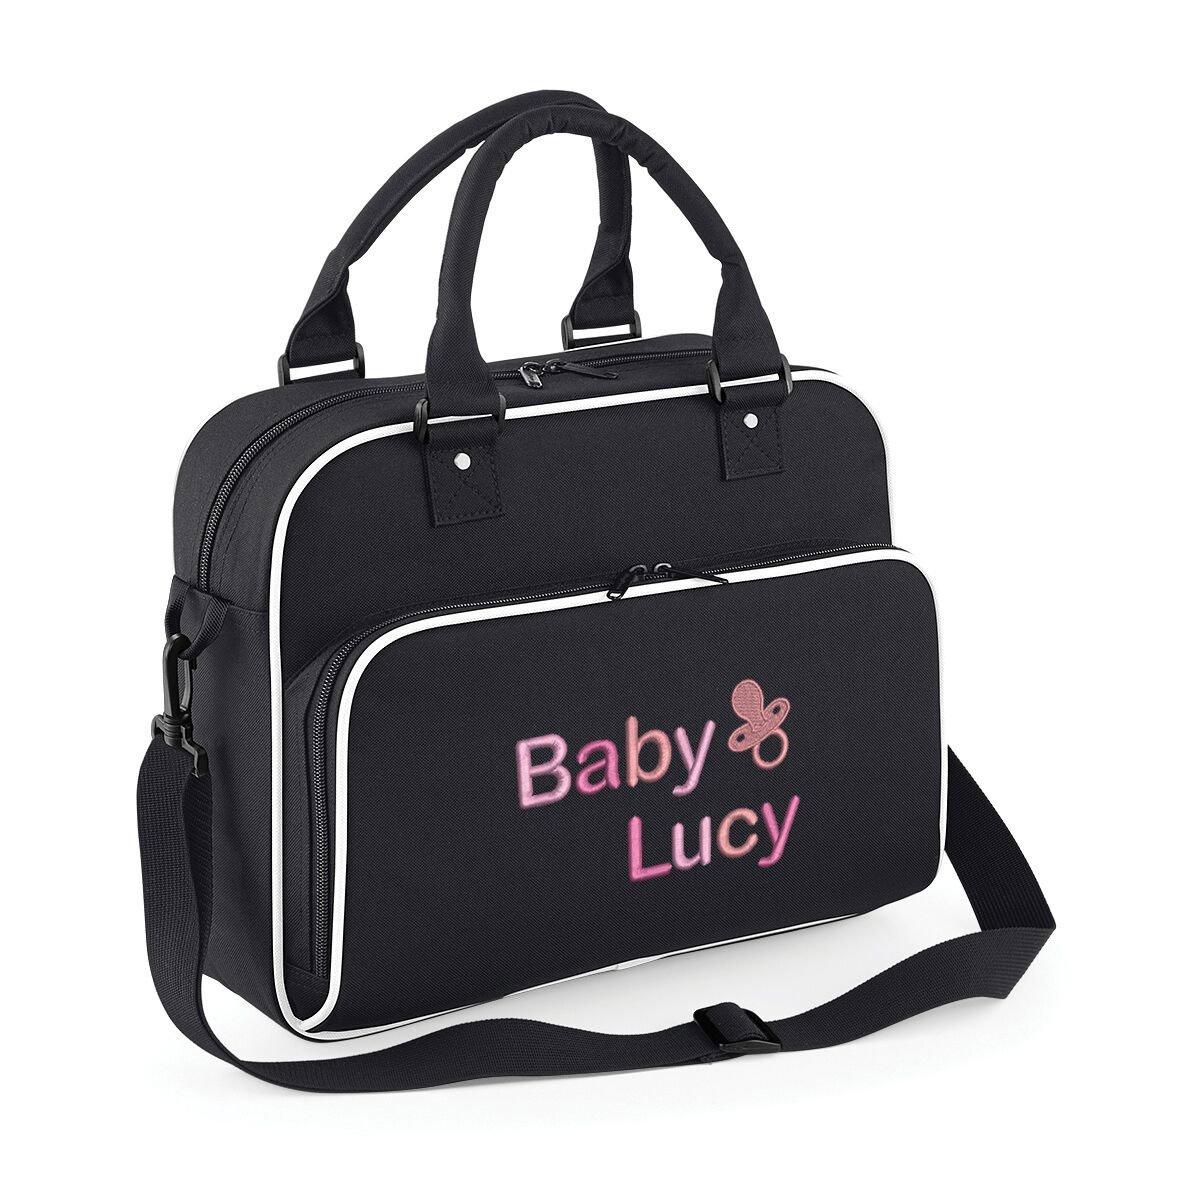 Dummy logo Black with white trim Personalised /& Stylish Baby Travel Nappy Changing Bag